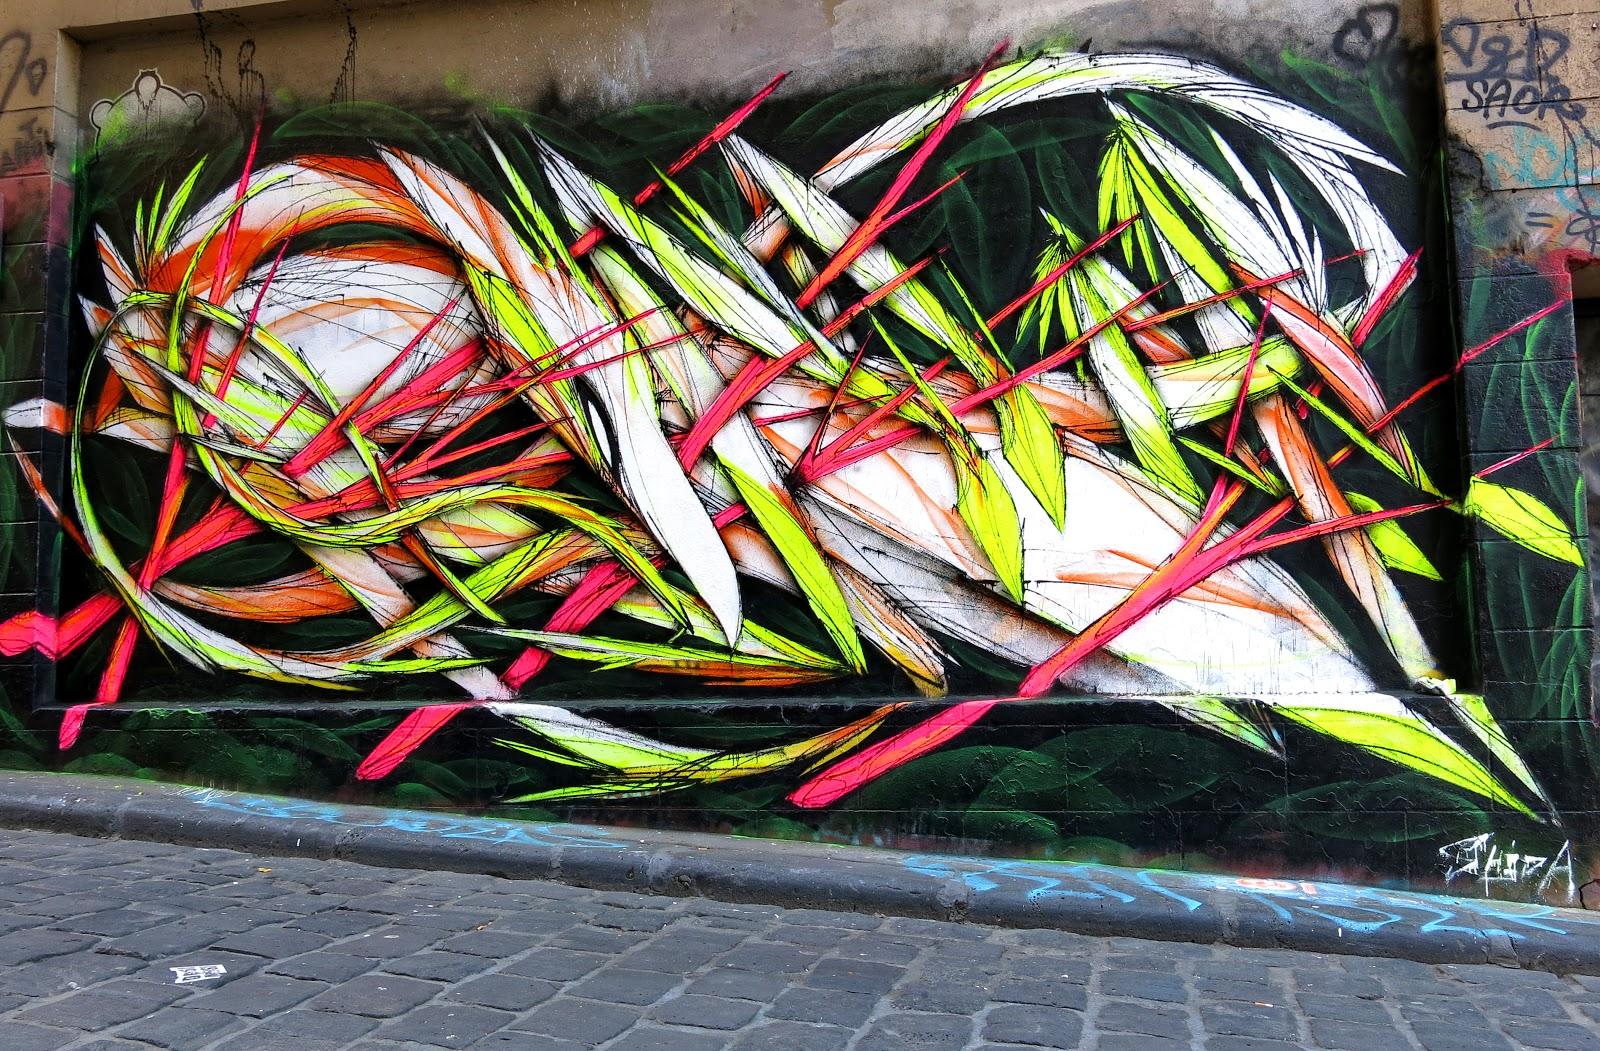 Shida New Murals In Melbourne, Australia | StreetArtNews ...